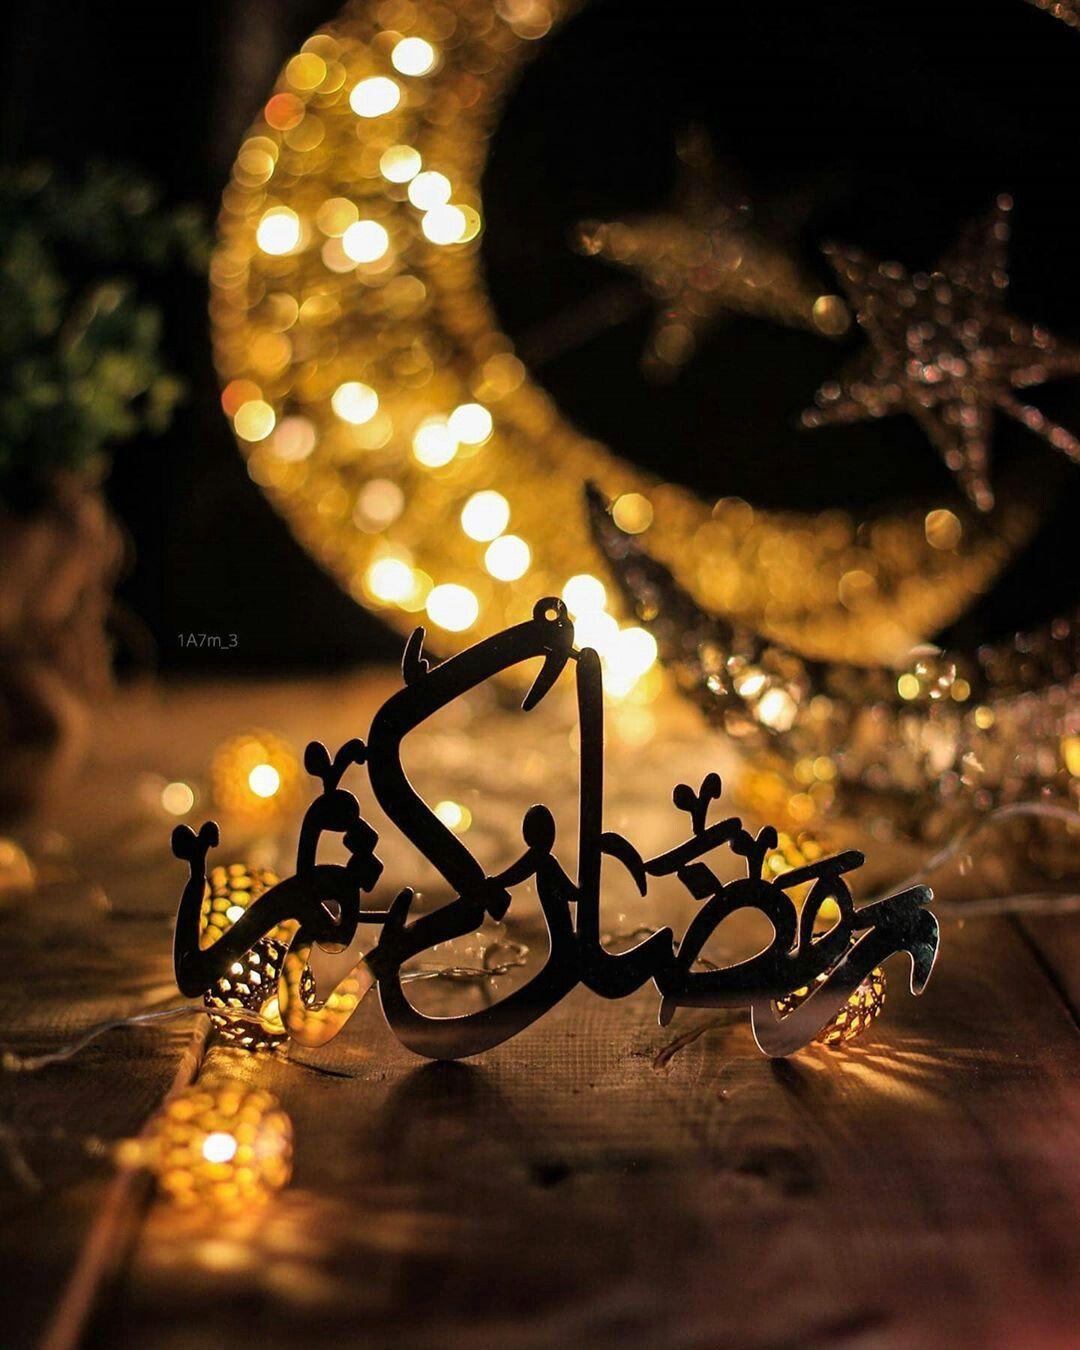 Pin By Hoda Elleithy On رمضان Ramadan Ramadan Images Ramadan Lantern Islam Ramadan